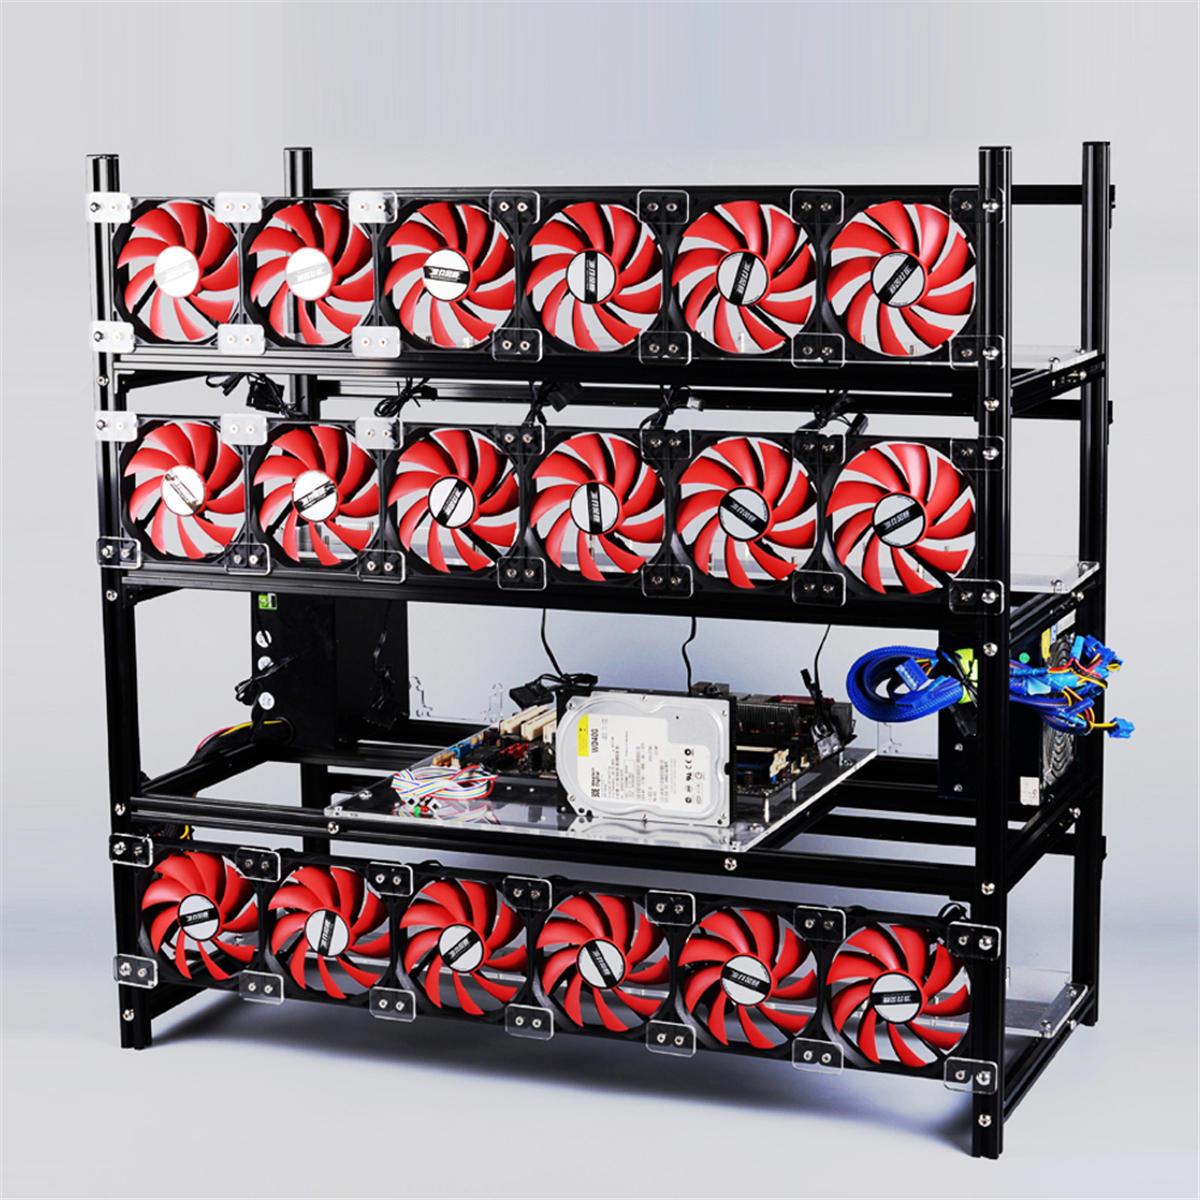 19 GPU Miner Frame Aluminum Stackable Open Air Mining Rig Case ETH BTC Ethereum